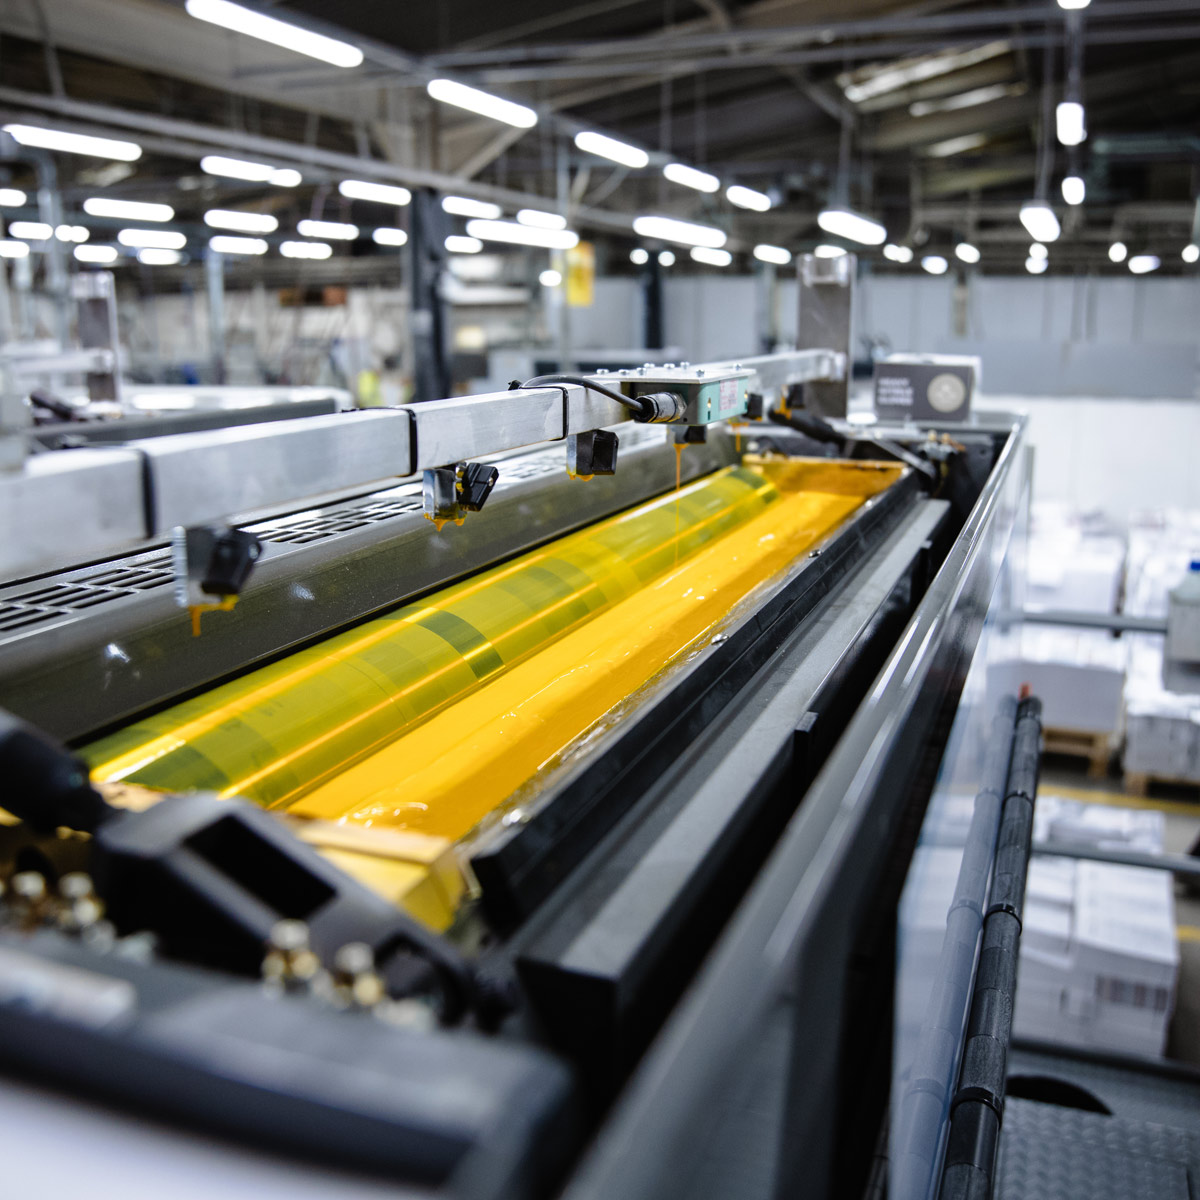 WG Baird Litho Print Services